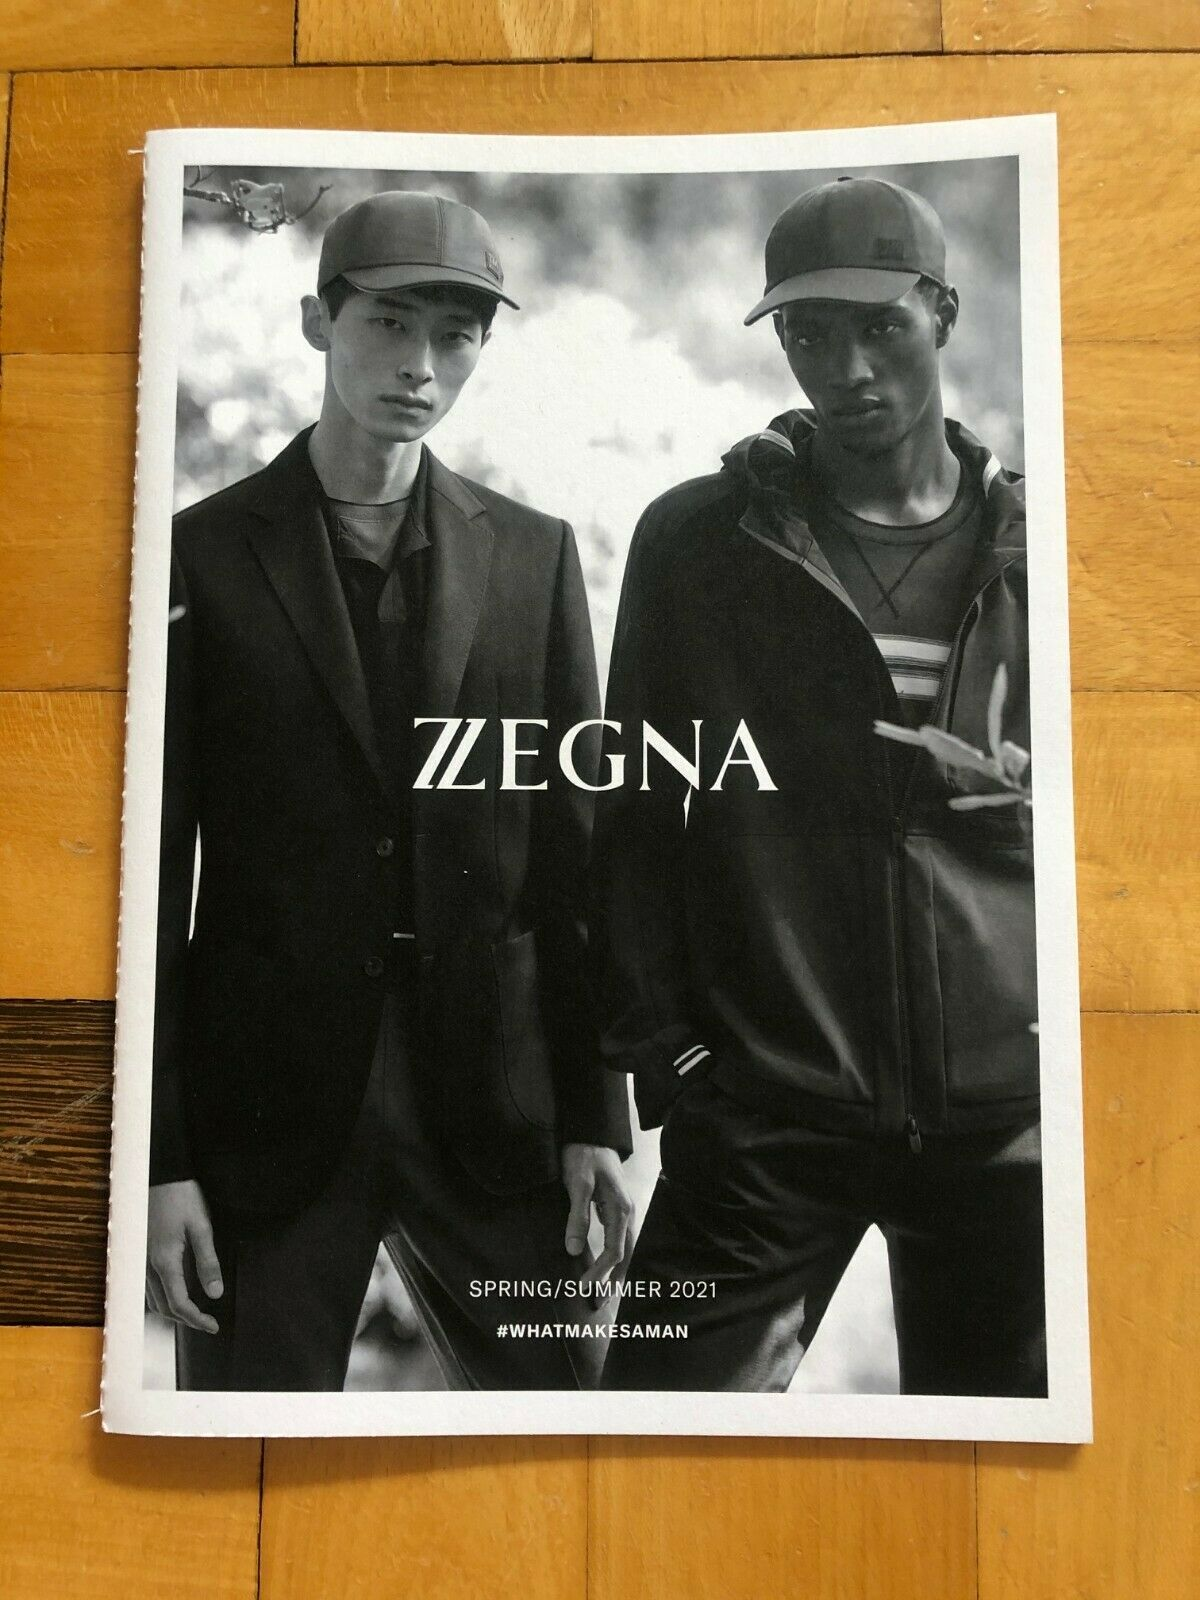 ERMENEGILDO ZEGNA – Katalog Frühling/Sommer 2021, neu, original, ungelesen